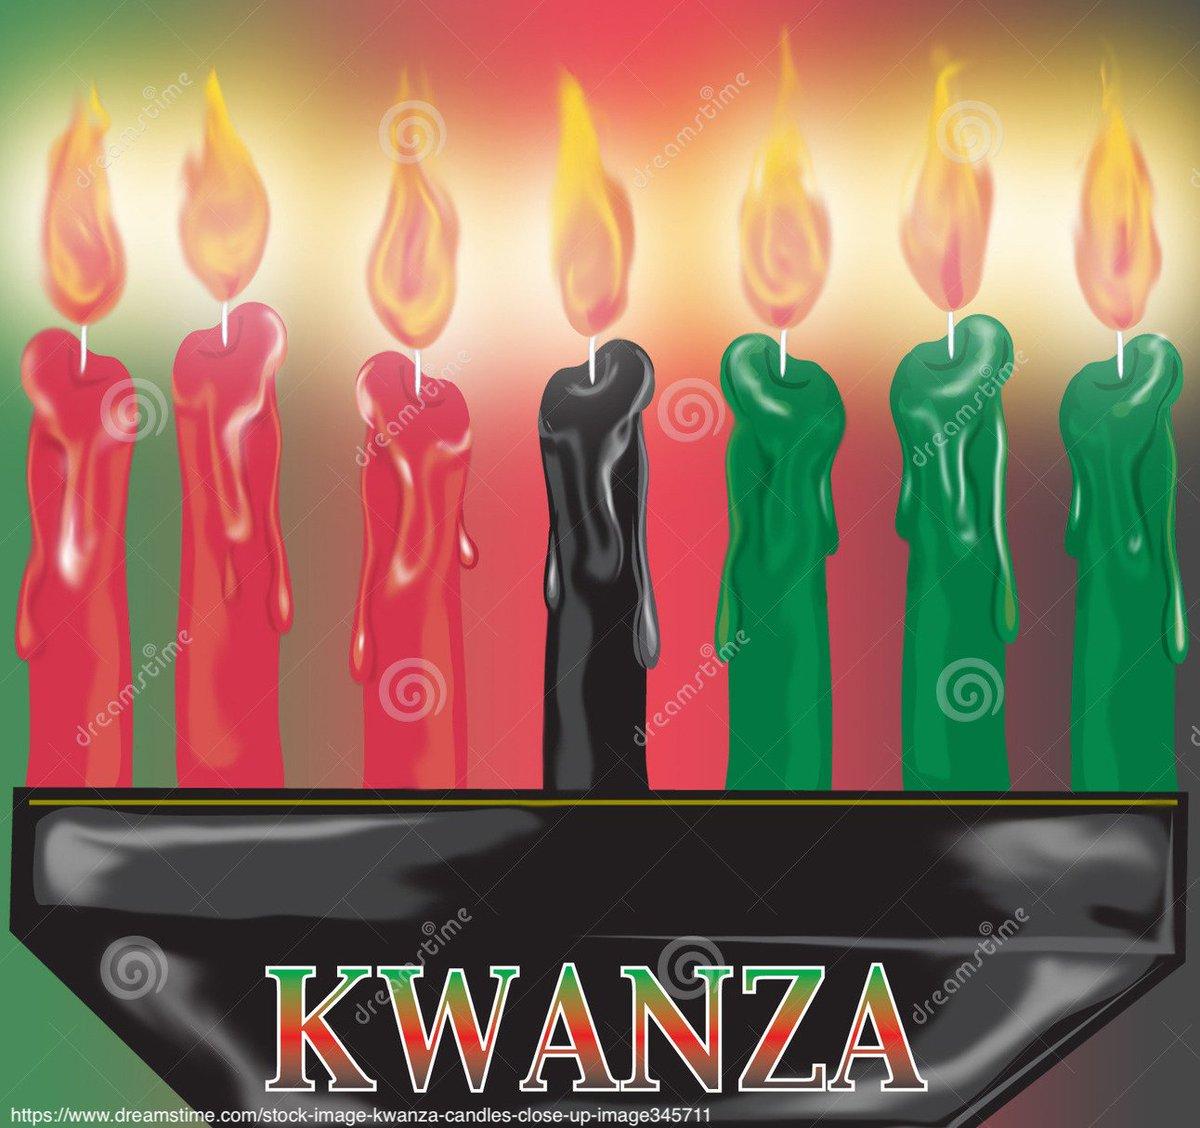 neil degrasse tyson on twitter happy kwanzaa december 26